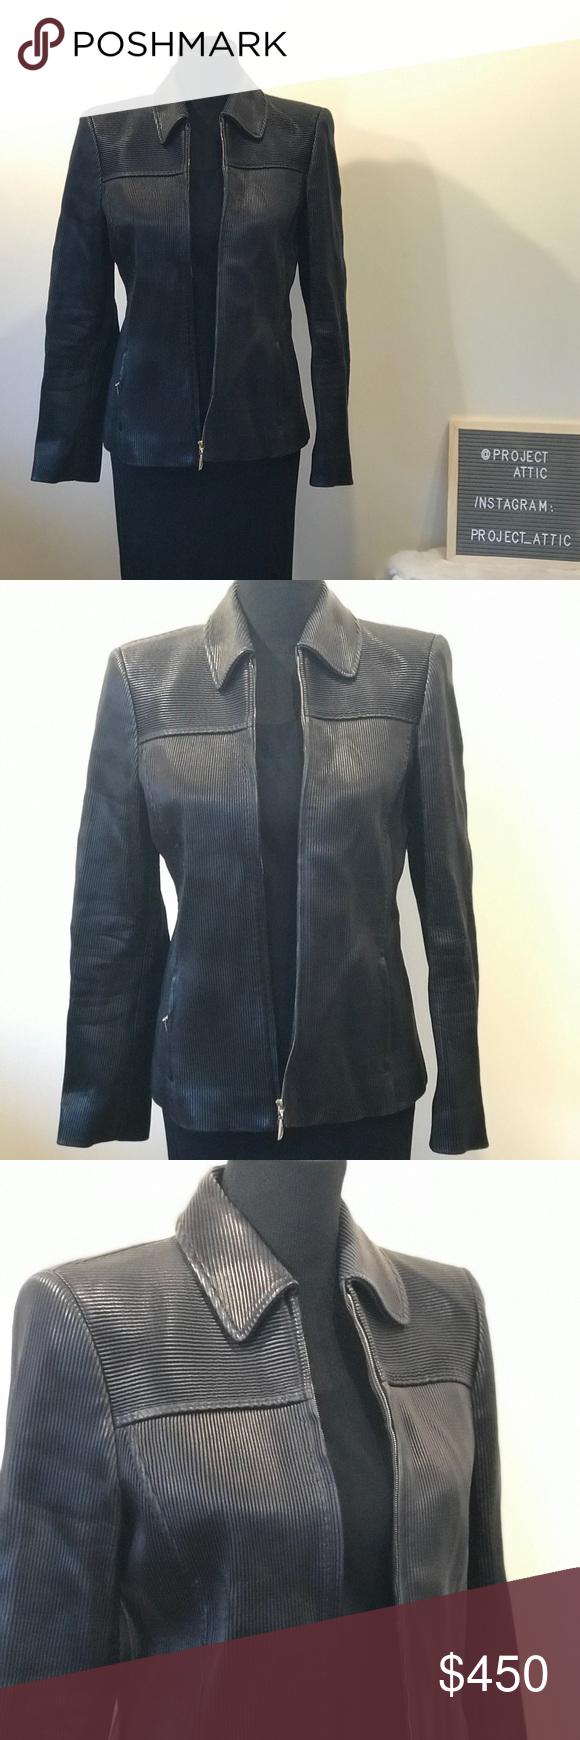 Escada Ribbed Nappa Leather Jacket Black 36 Leather Jacket Black Leather Jacket Jackets [ 1740 x 580 Pixel ]